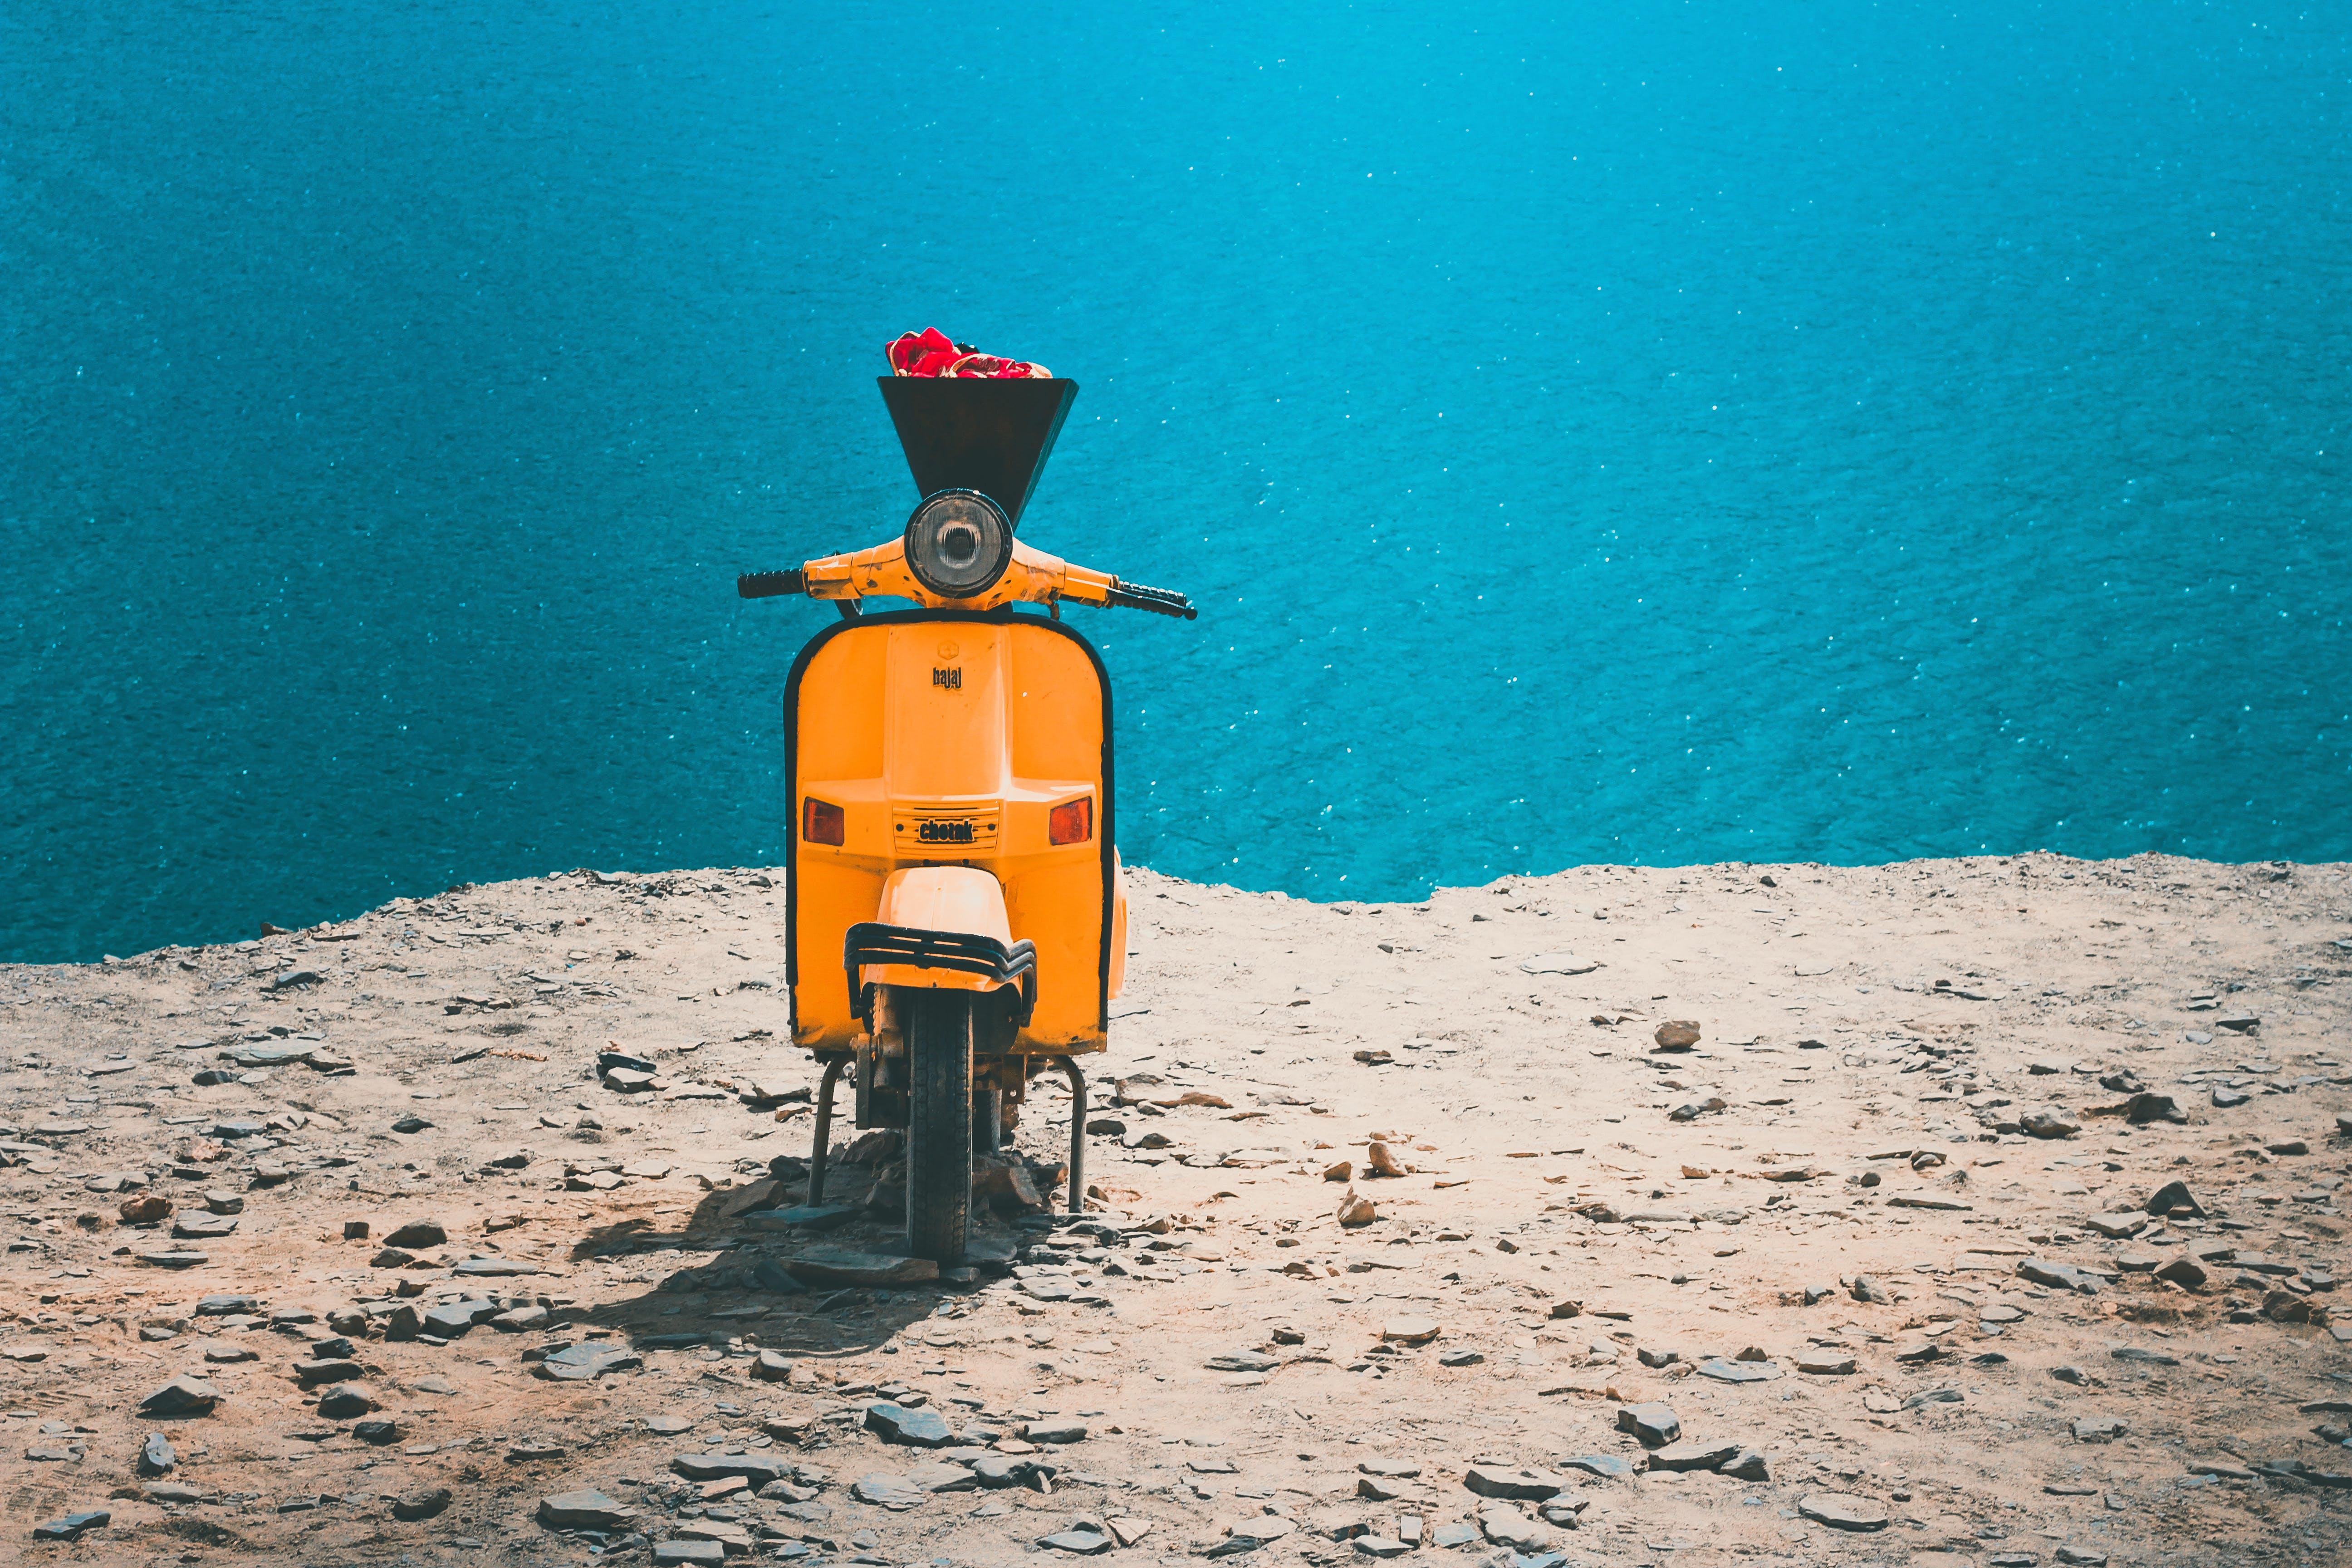 Orange and Black Motorcycle on Brown Sand